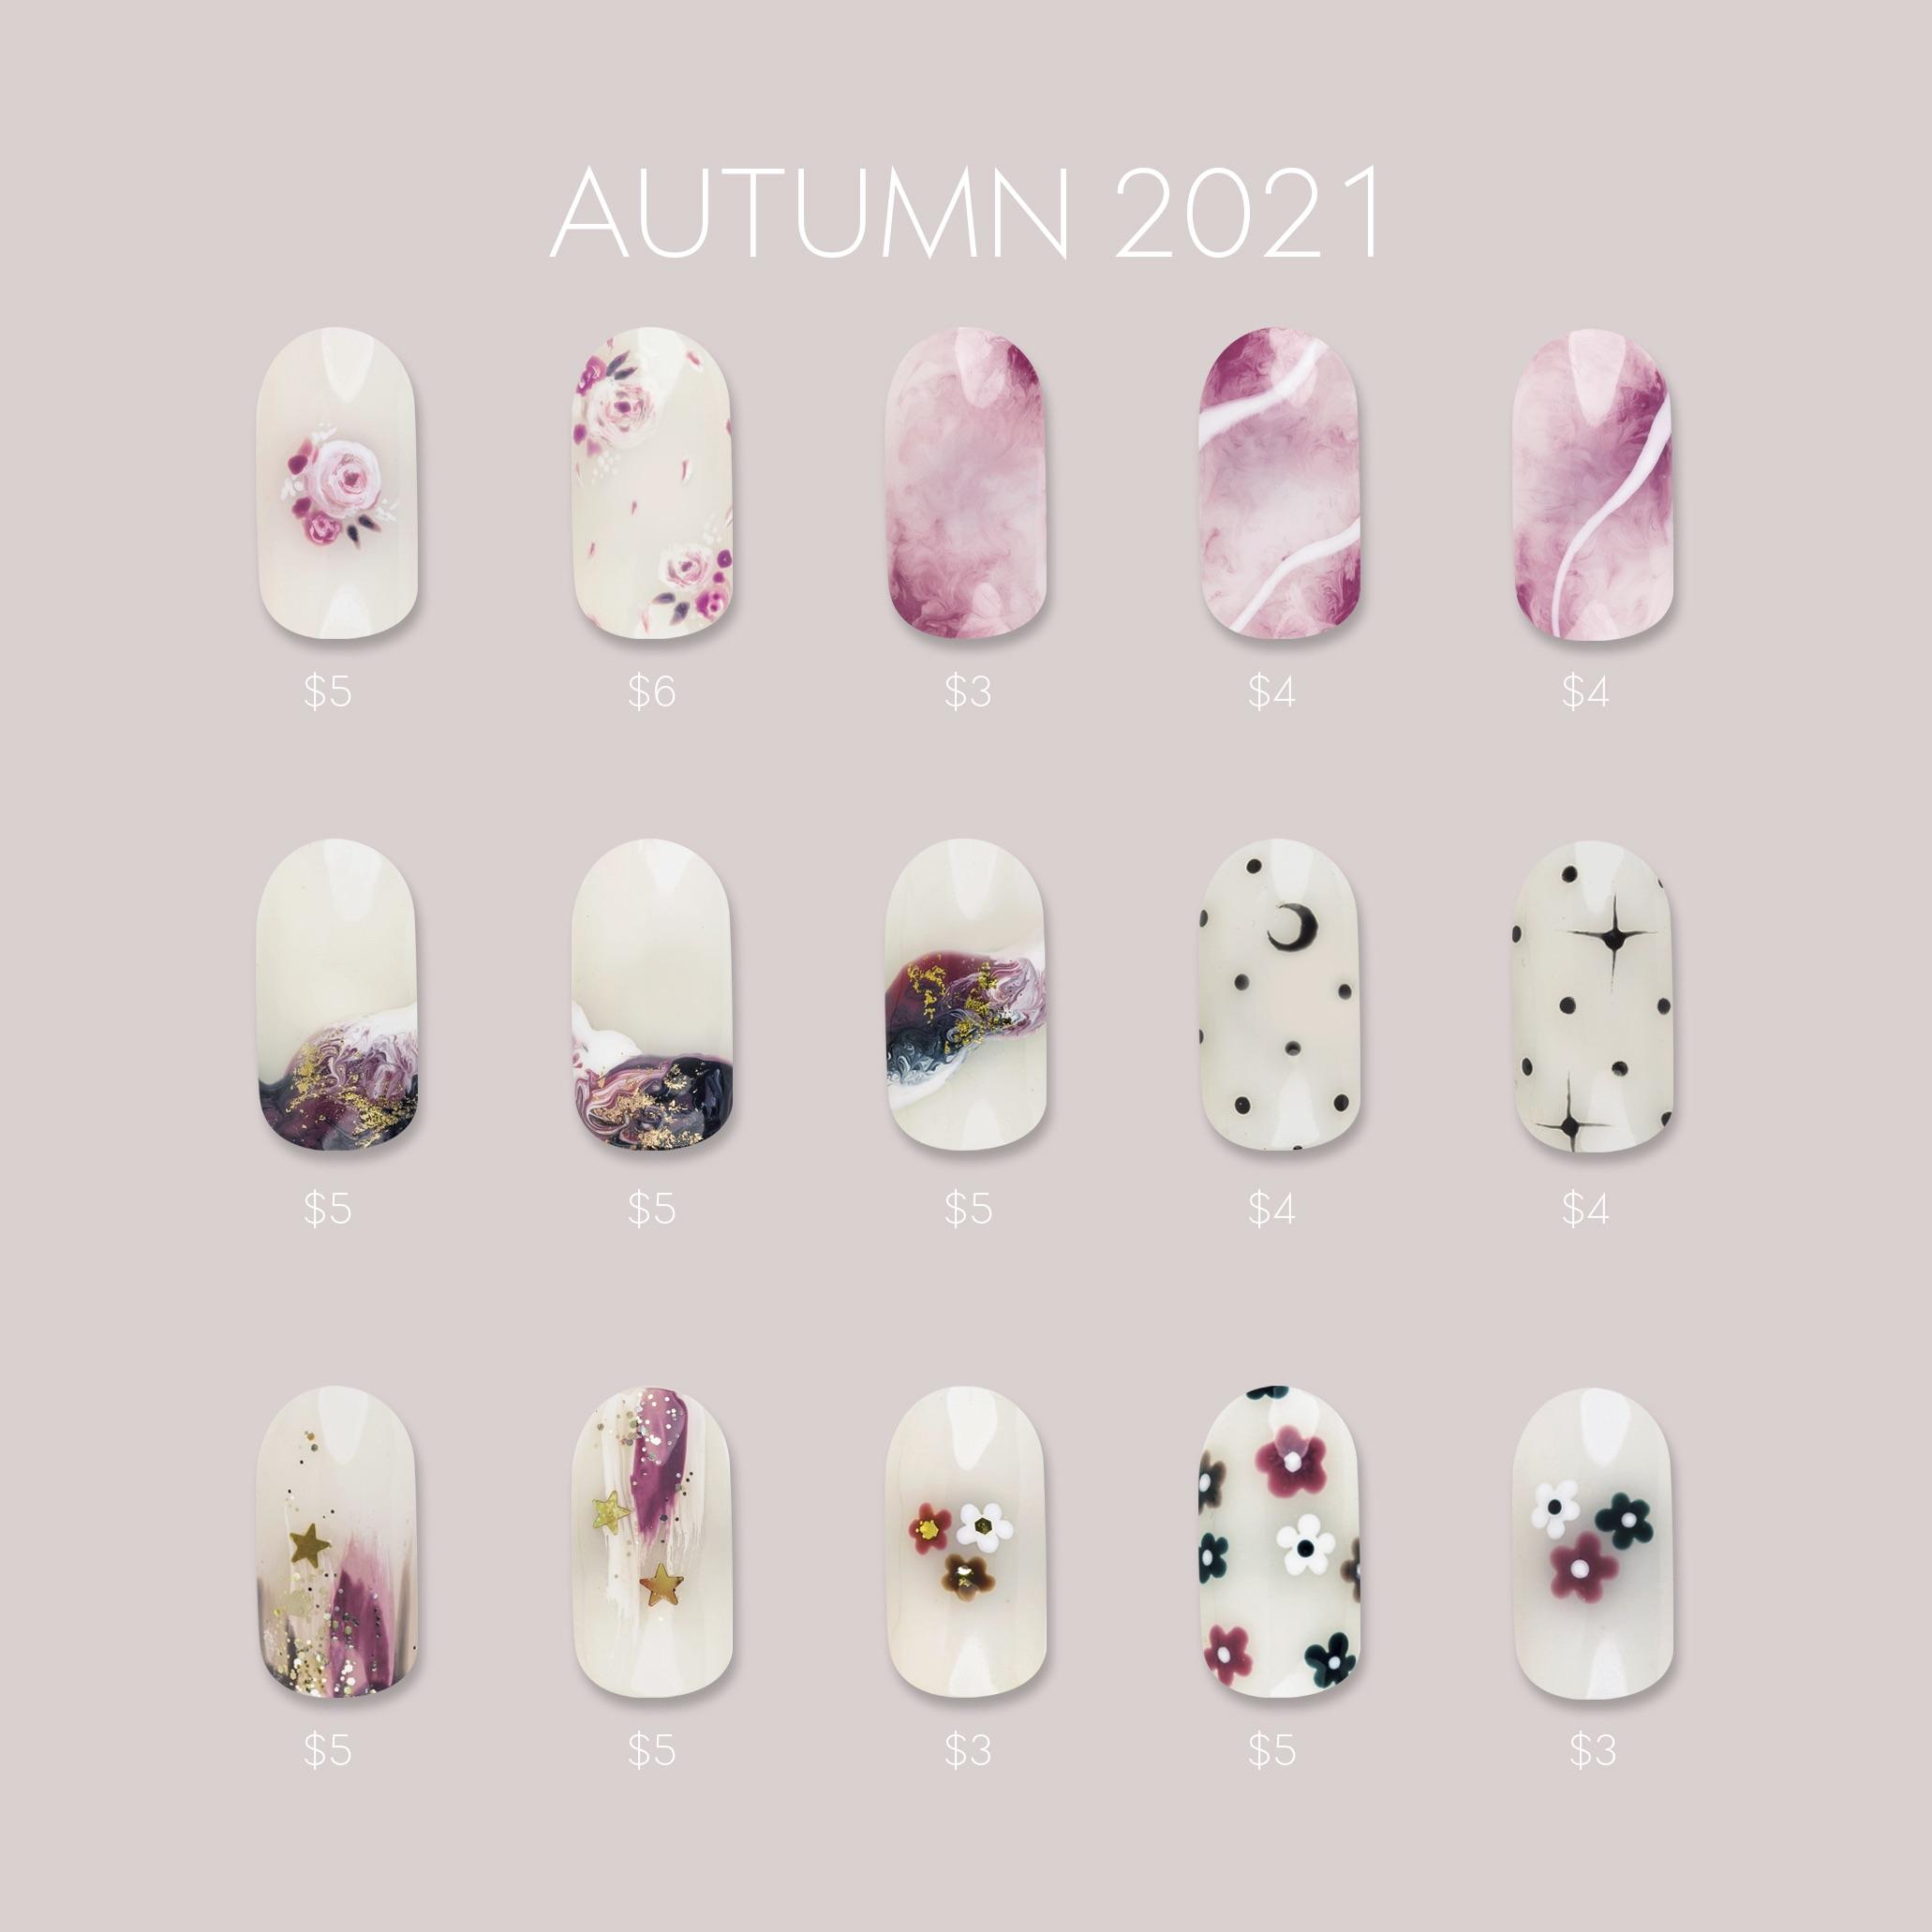 Autumn 2021 Menu